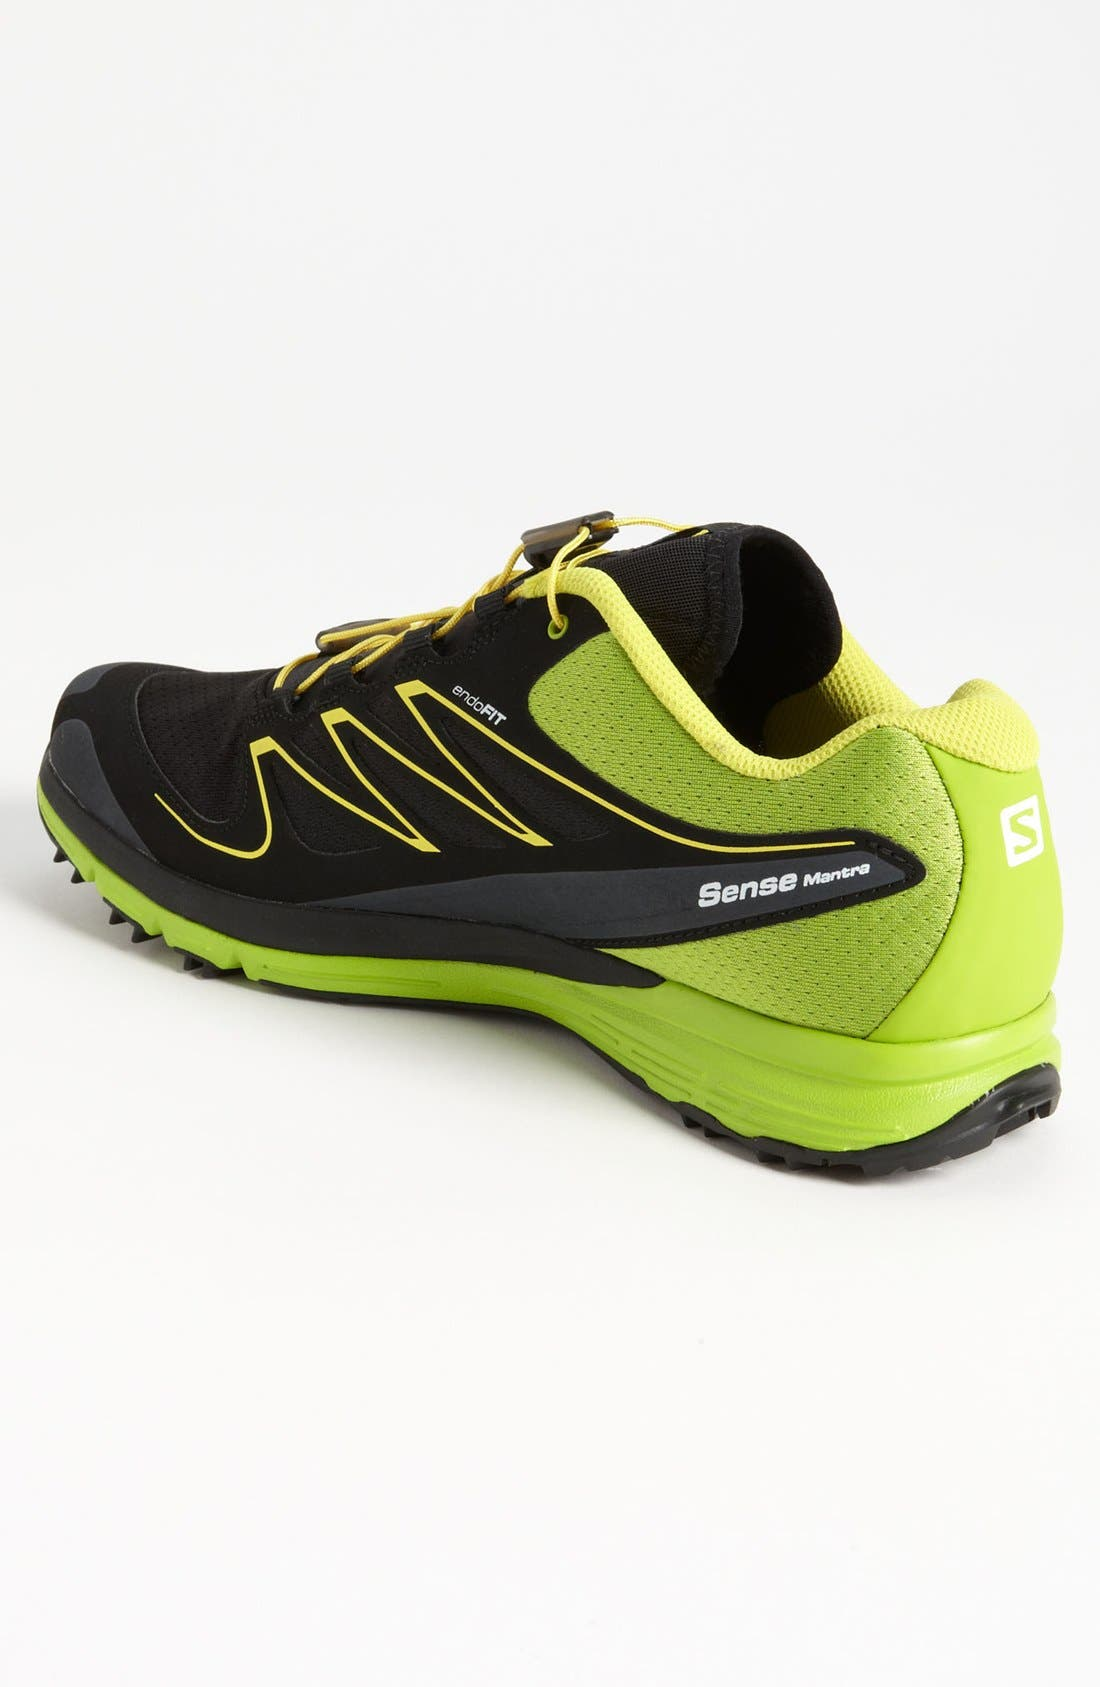 'Sense Mantra' Running Shoe,                             Alternate thumbnail 2, color,                             001